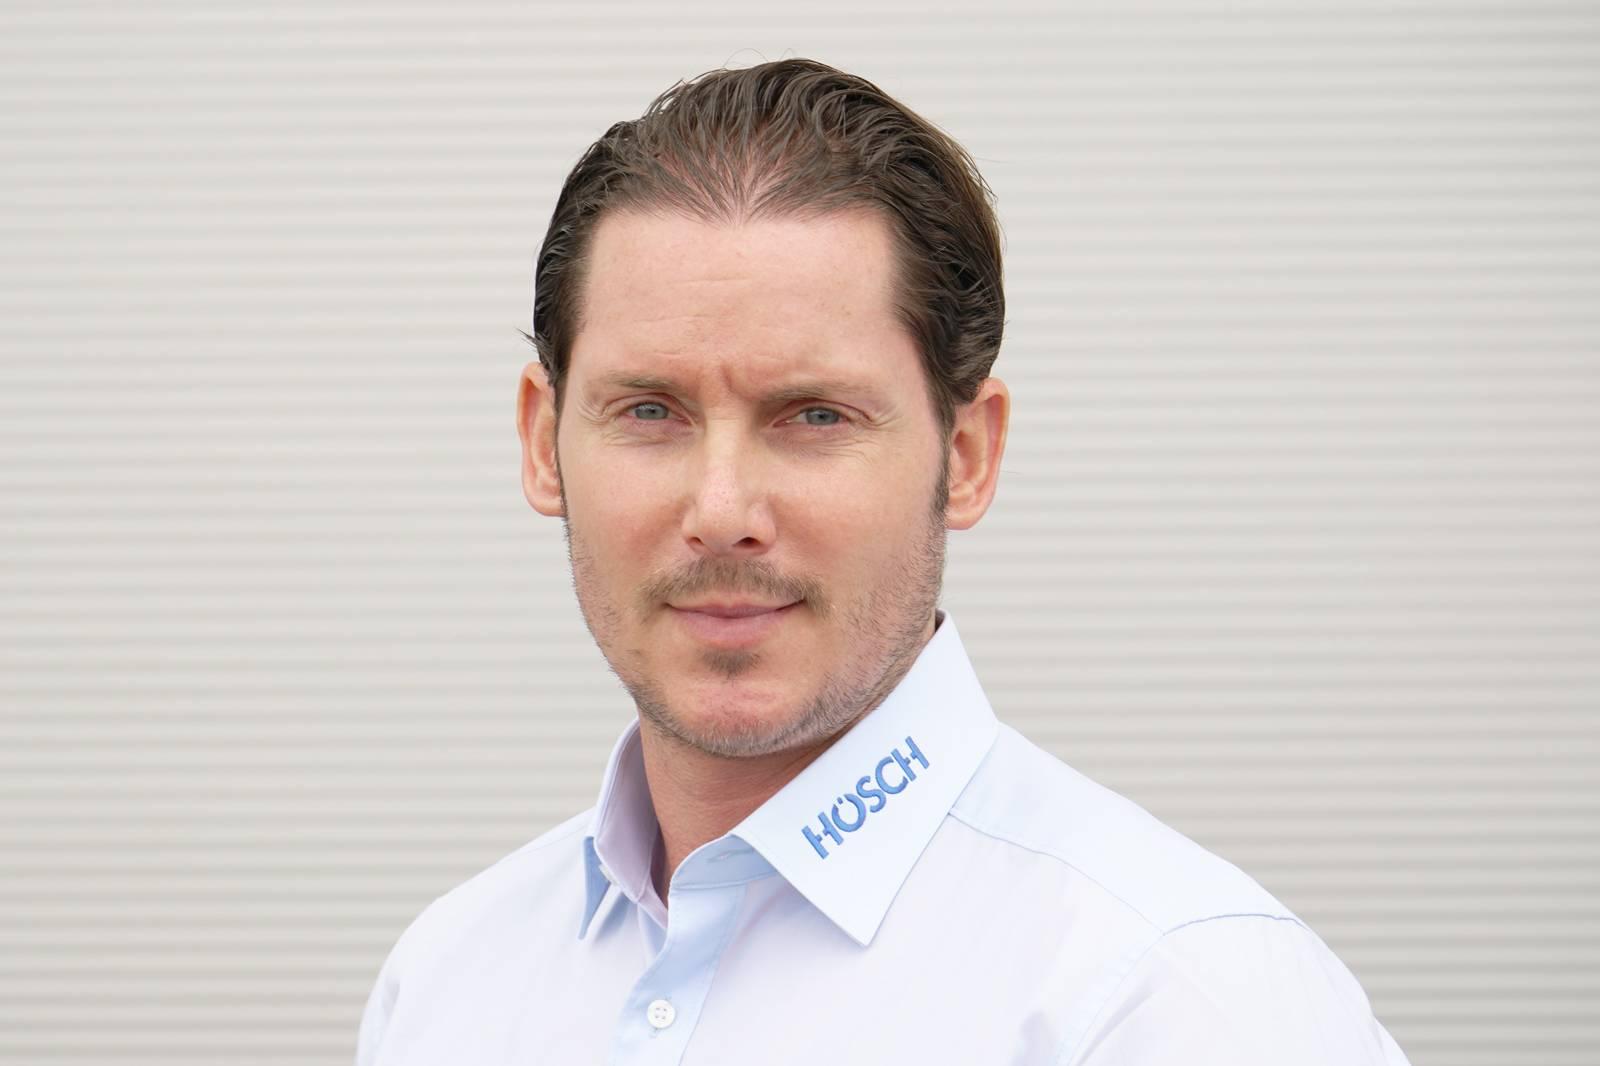 Markus Panzenböck